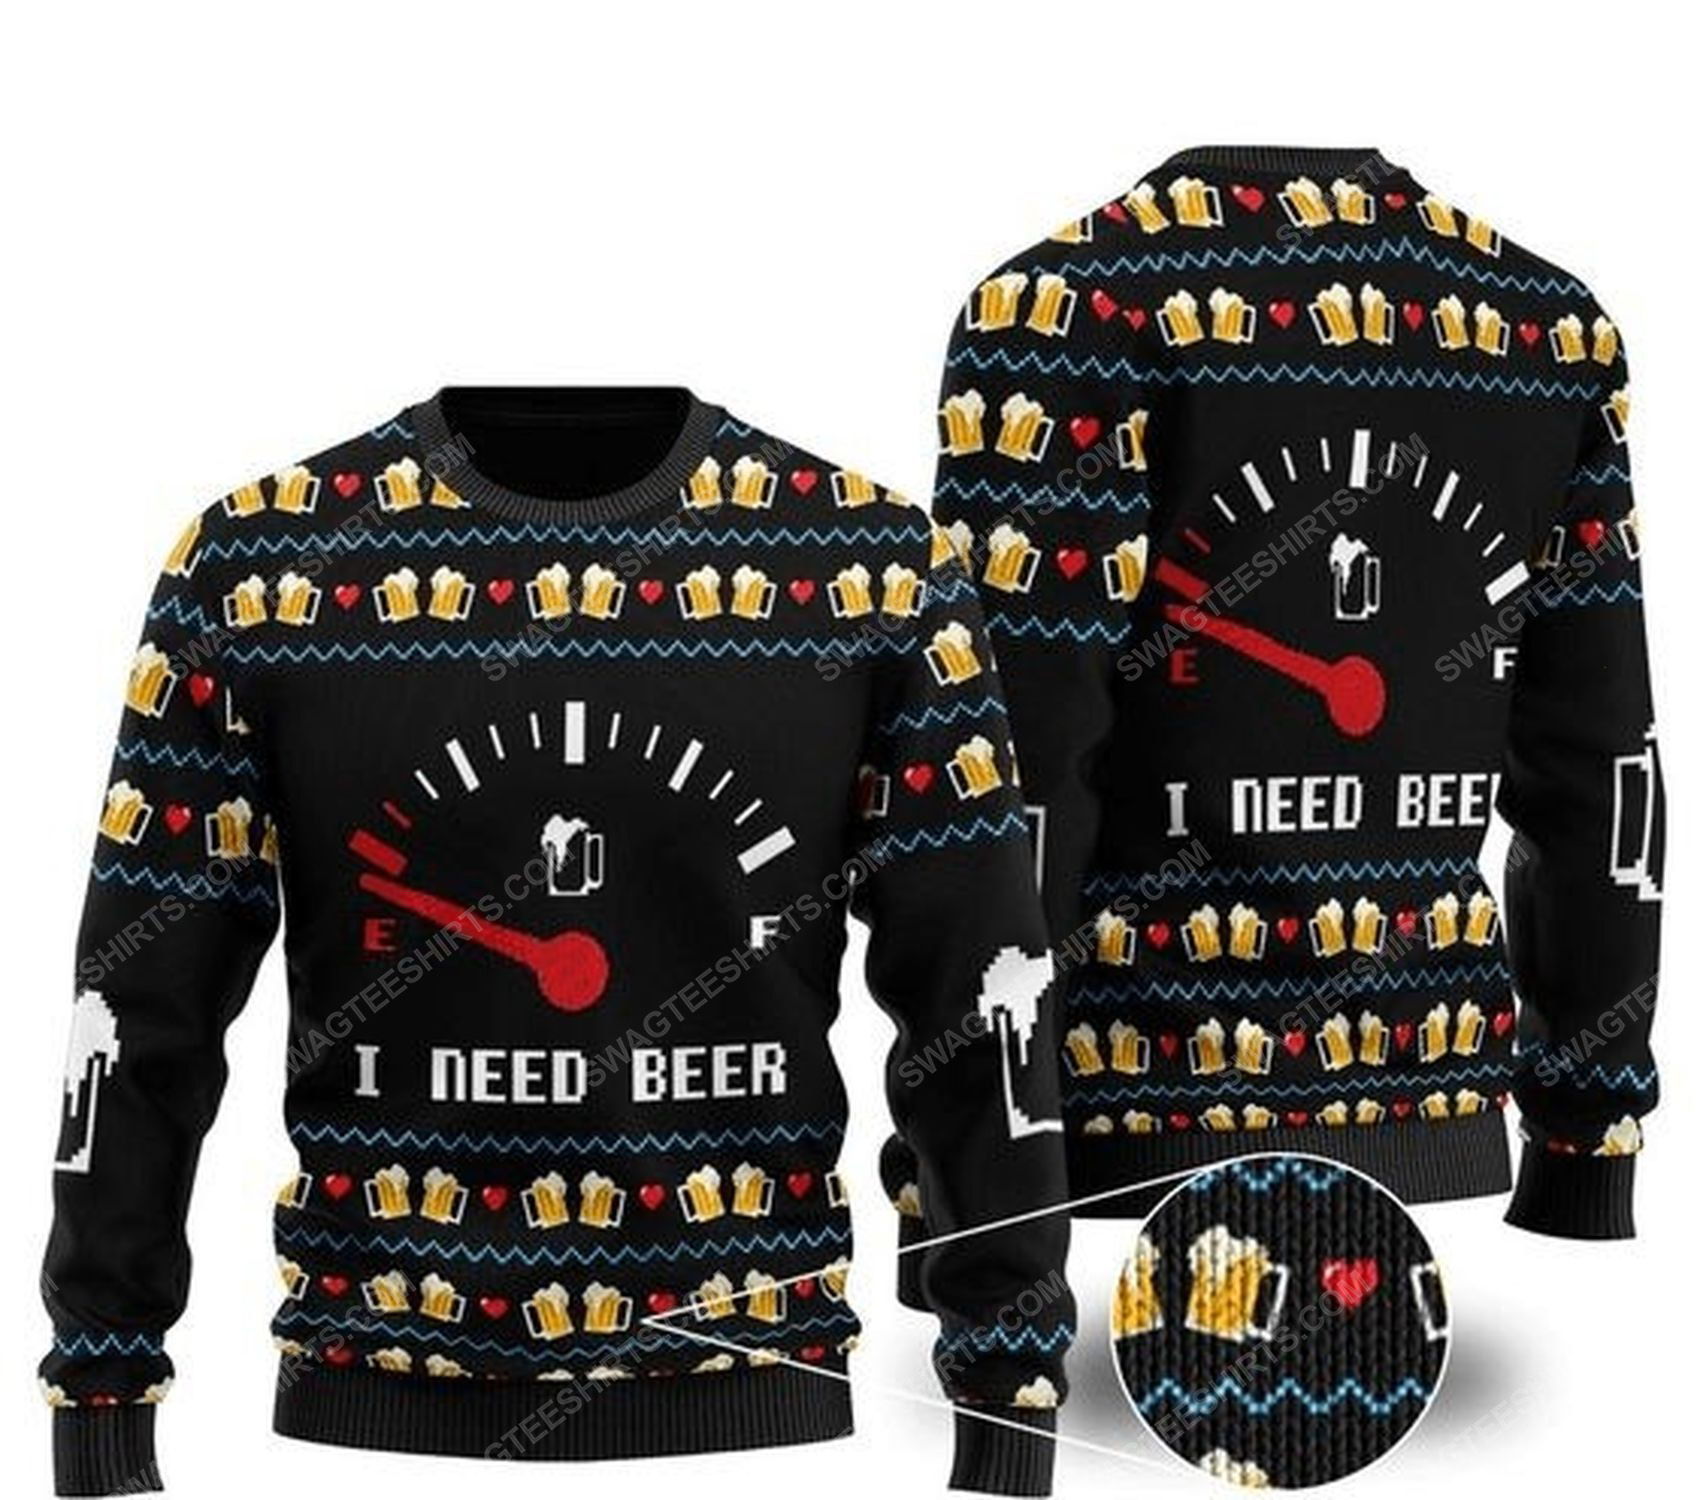 I need beer all over print ugly christmas sweater 1